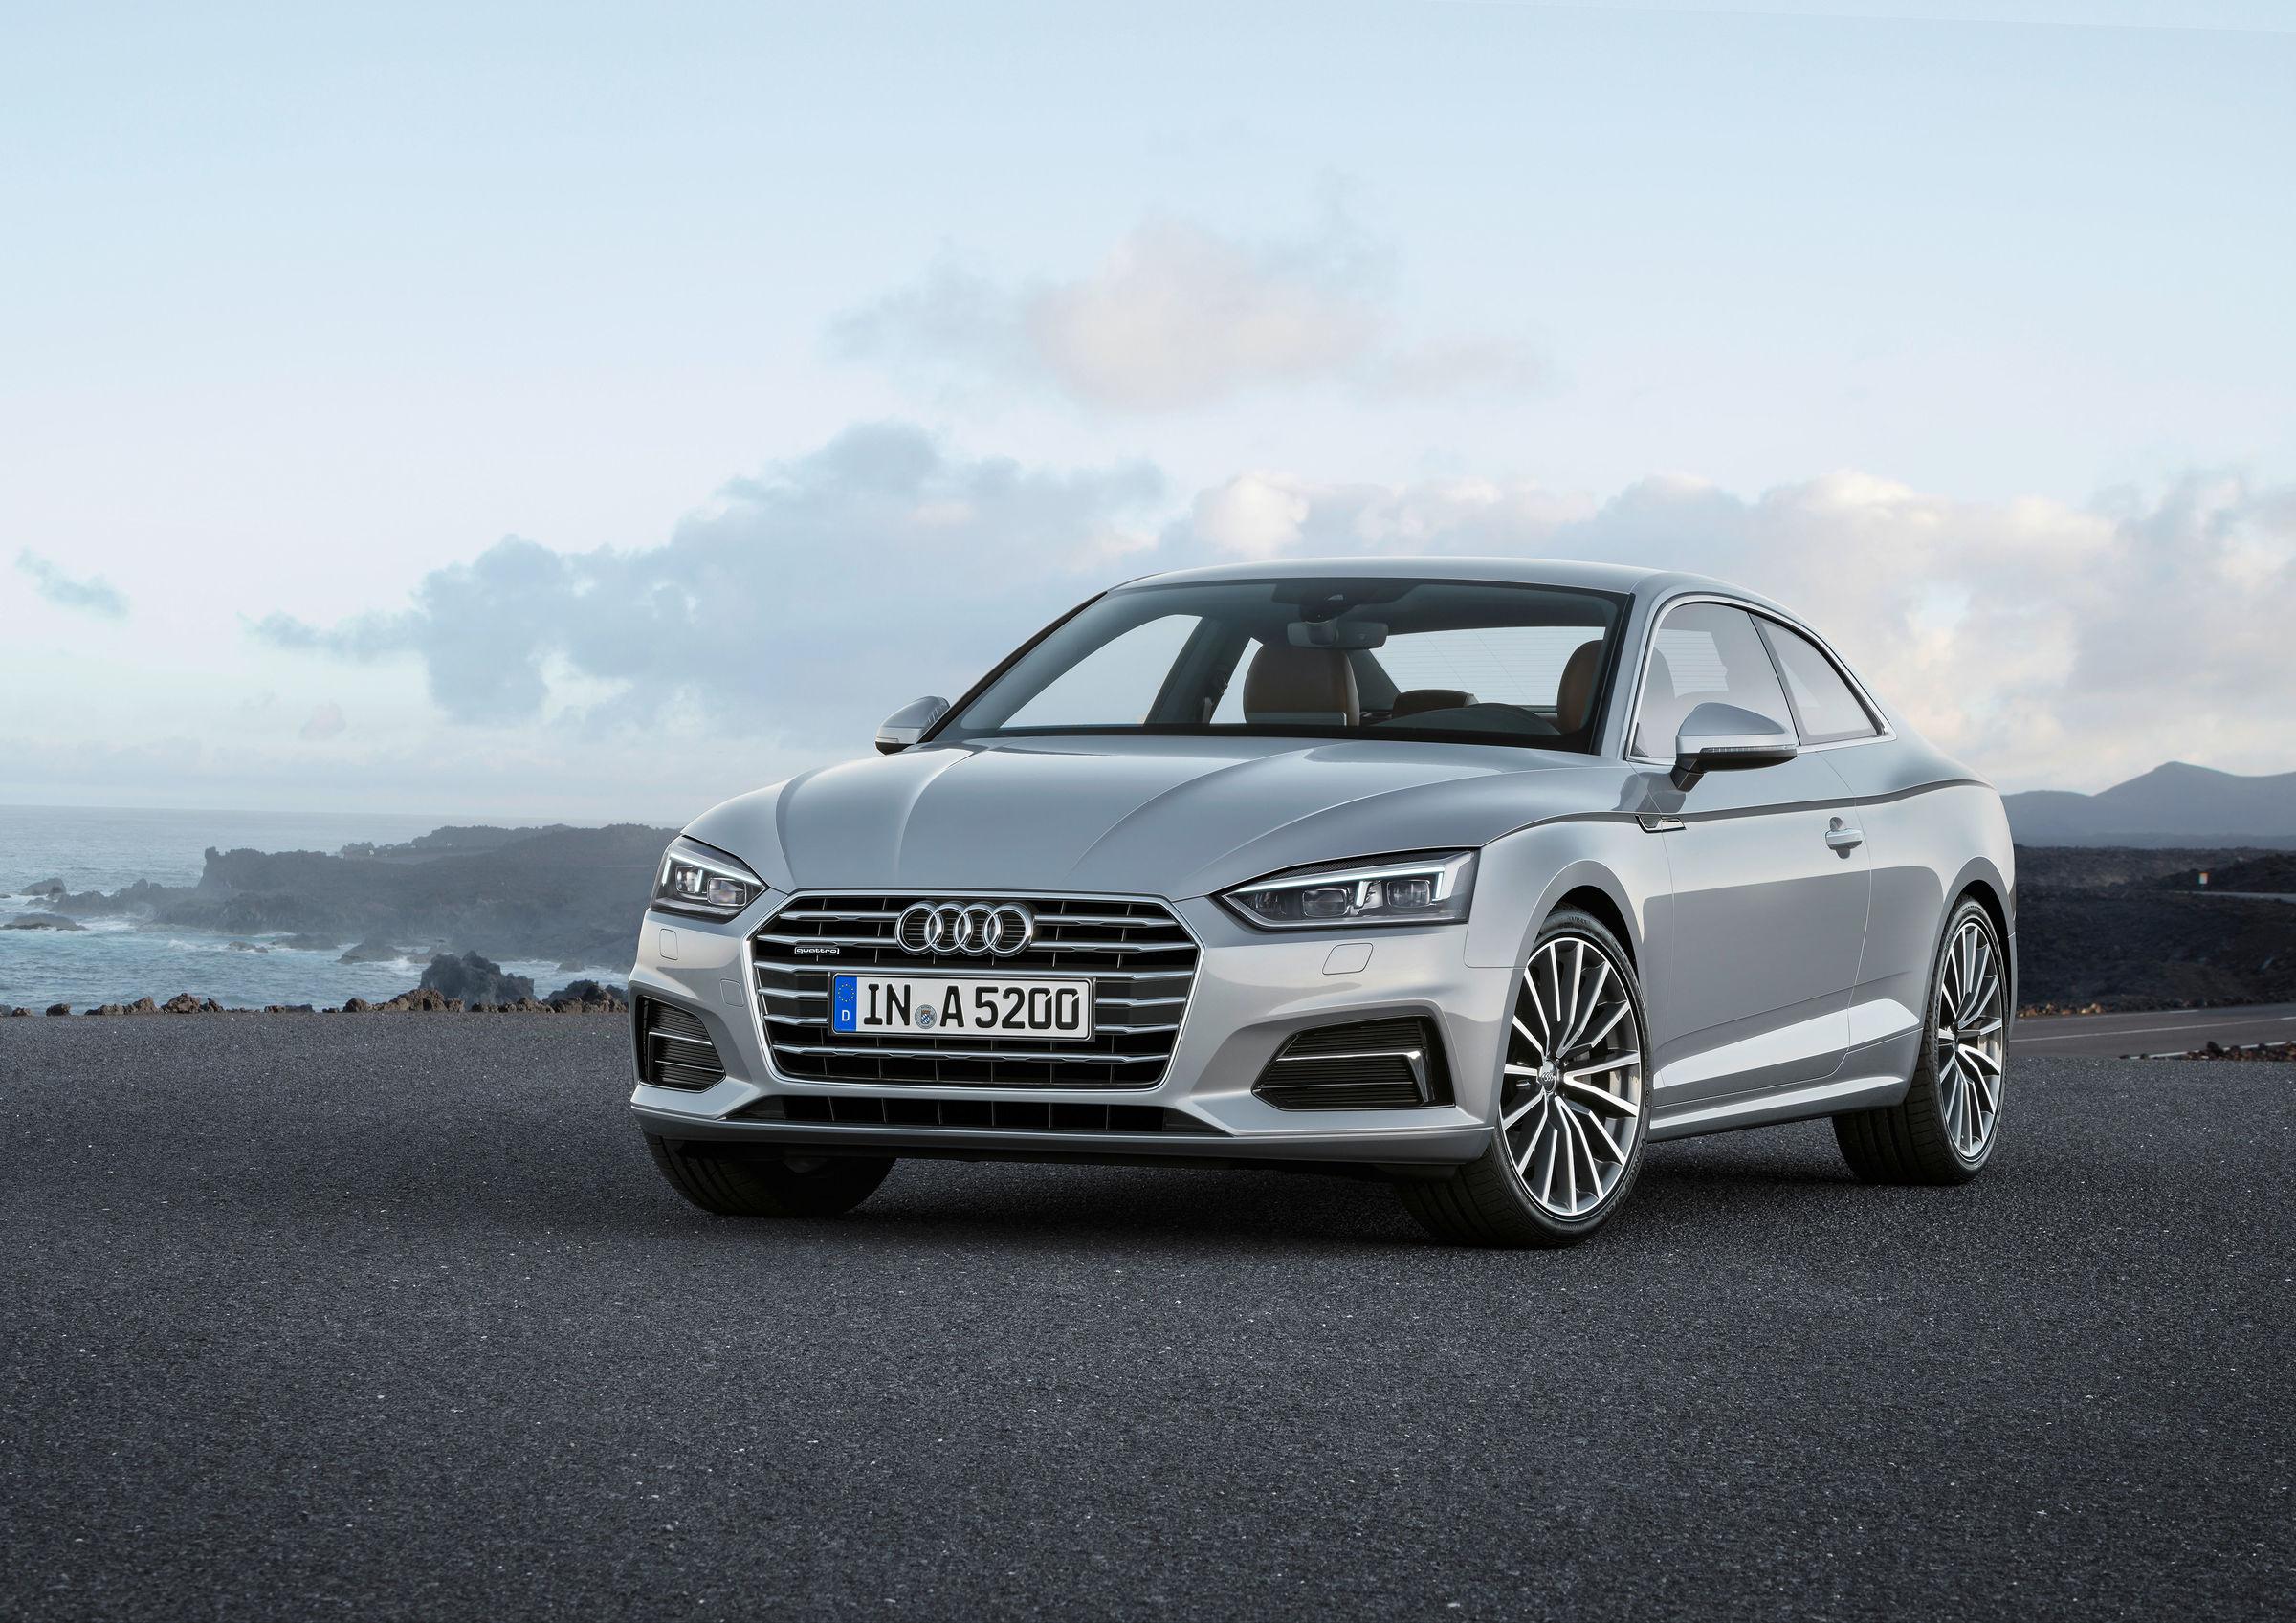 World Premiere Of The New Audi A Coupé Audi MediaCenter - Audi a5 coupe